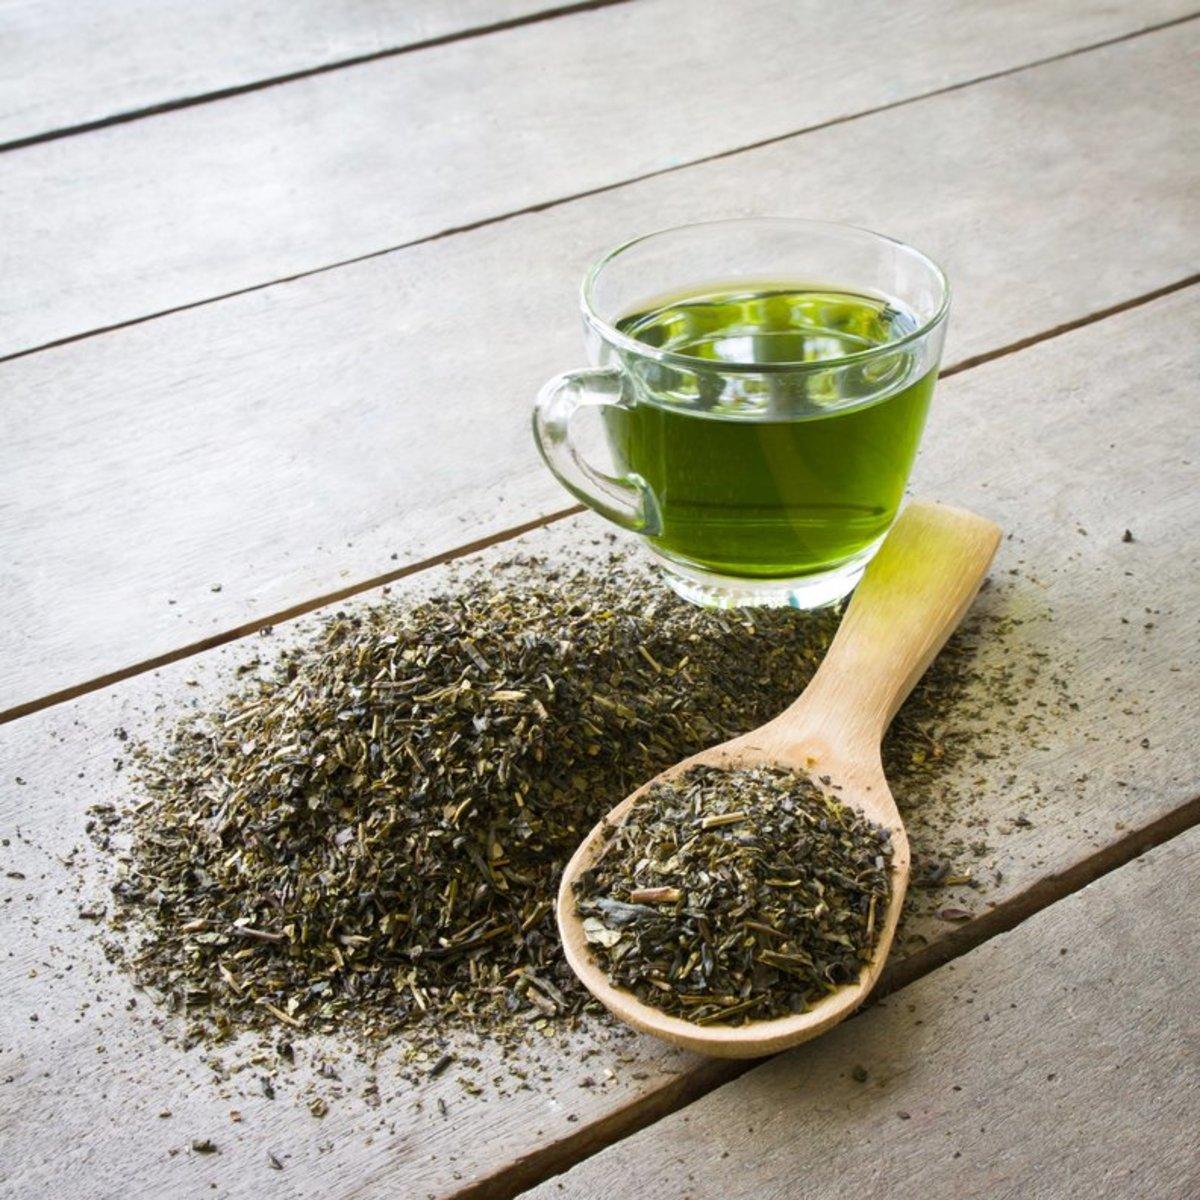 Pure green tea